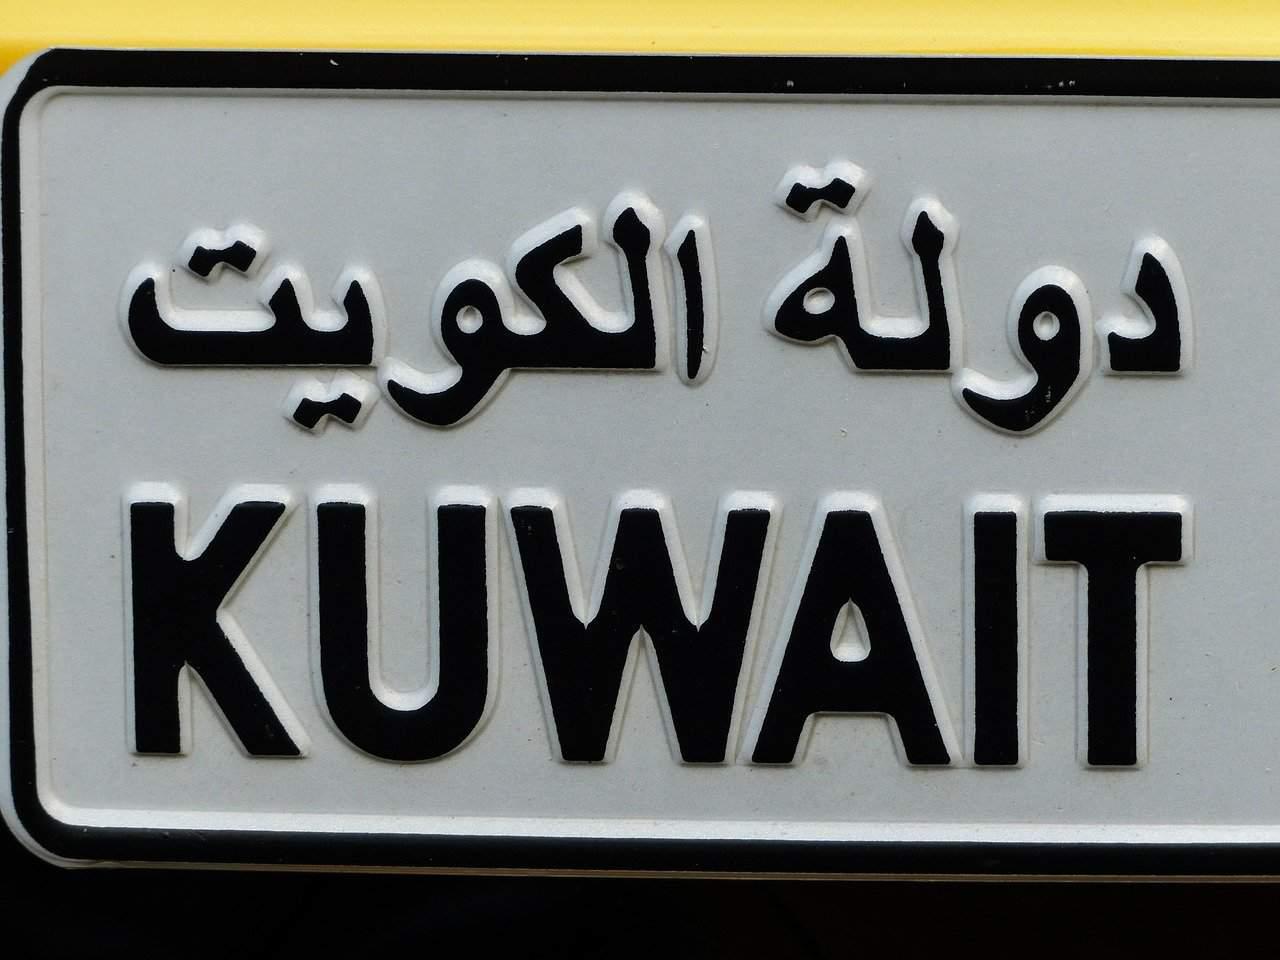 Long-term future of Hungary-Kuwait trade ties bright, says state secretary